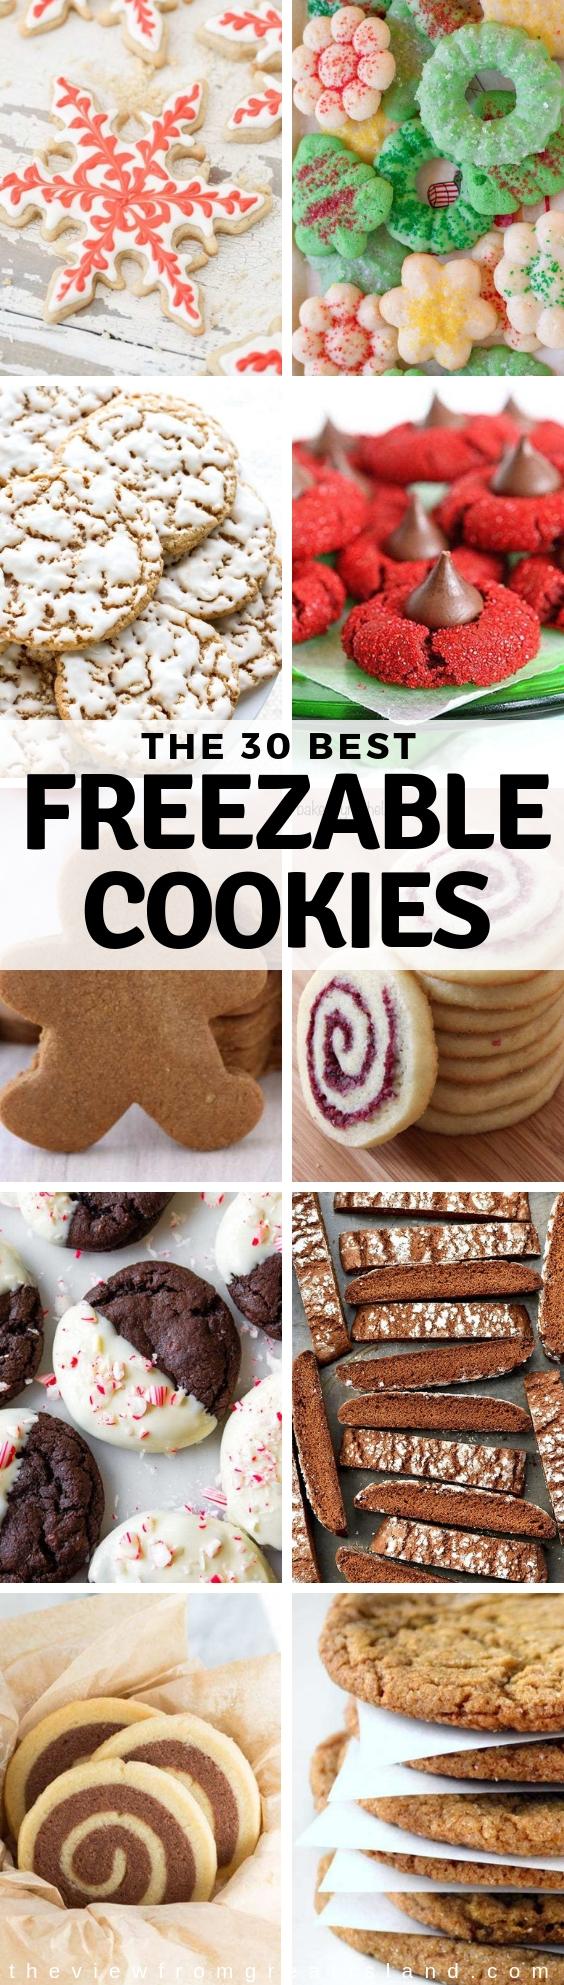 freezable cookies pin